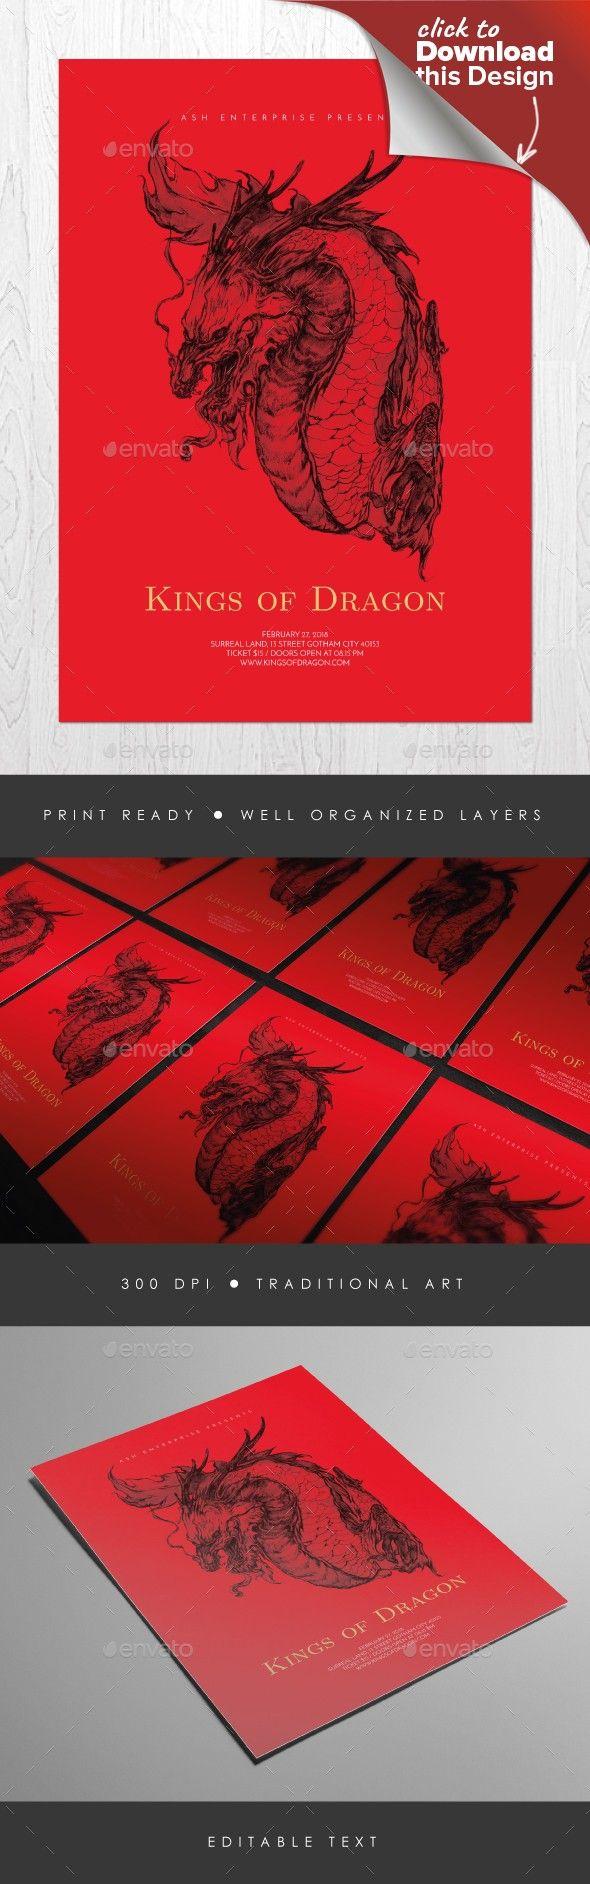 album cover, alternative, artsy, china, chinese, cover art, dragon